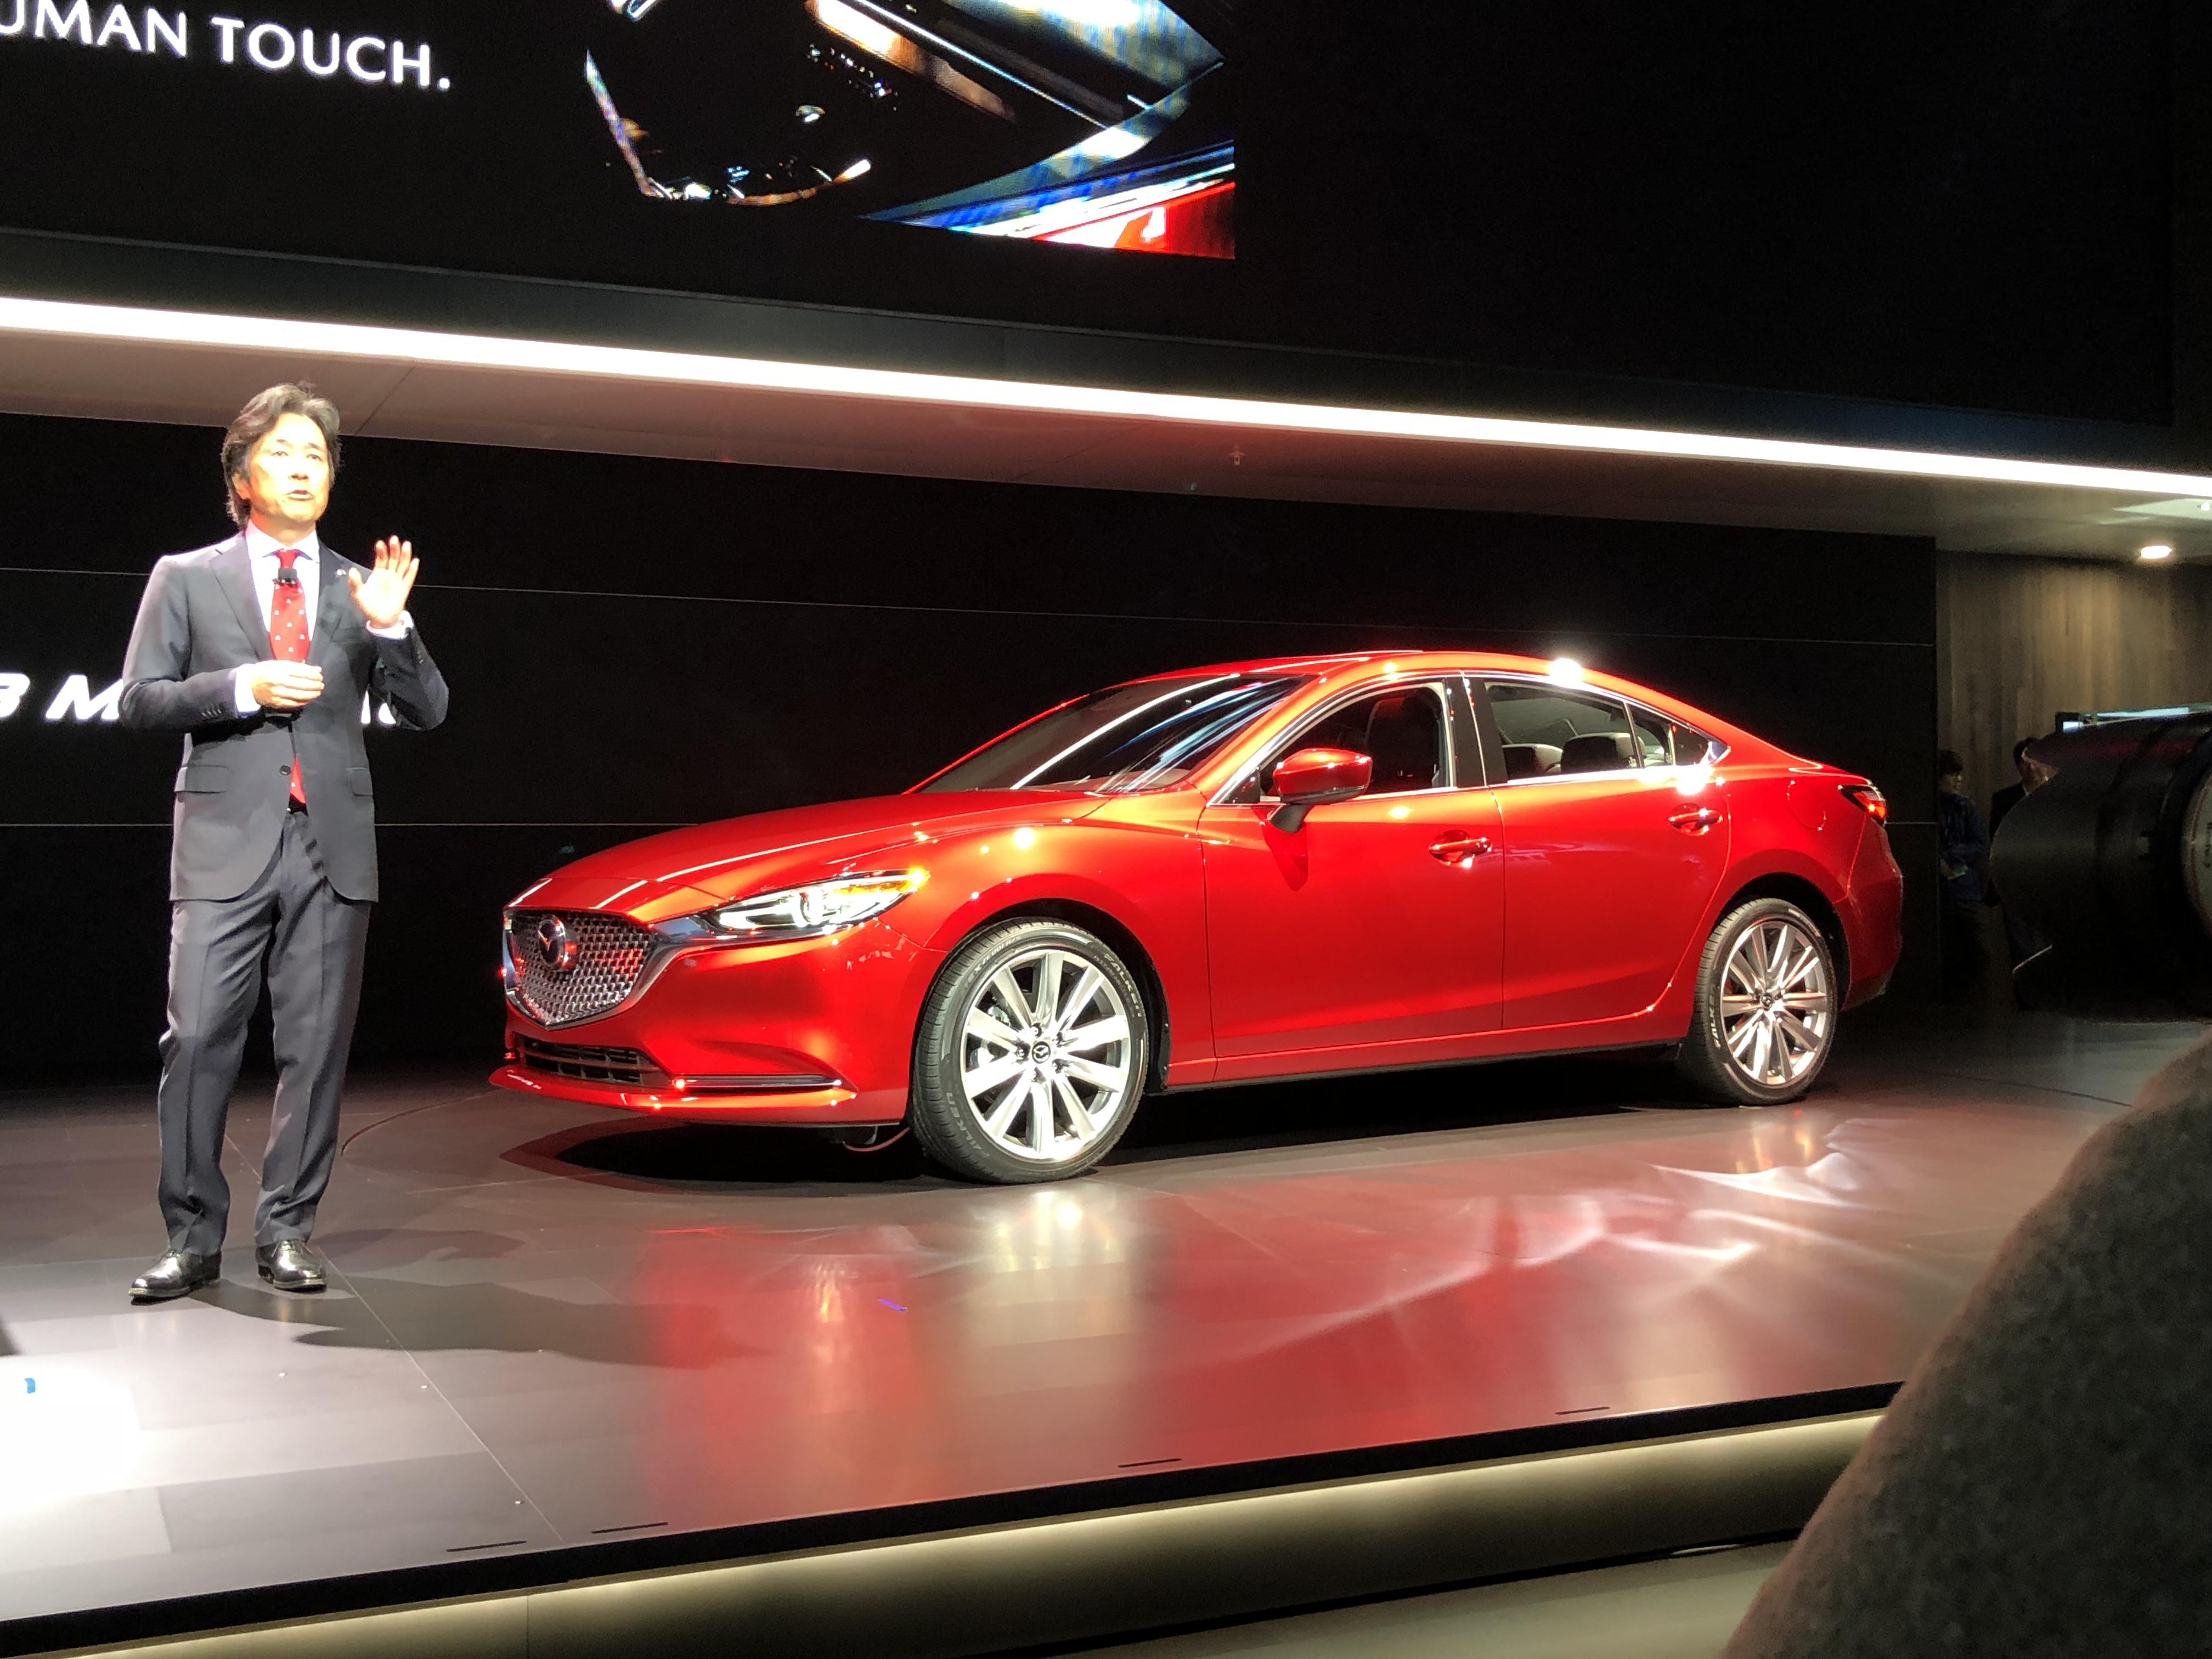 2018 Mazda 6 revealed: Turbo petrol coming to Australia ...